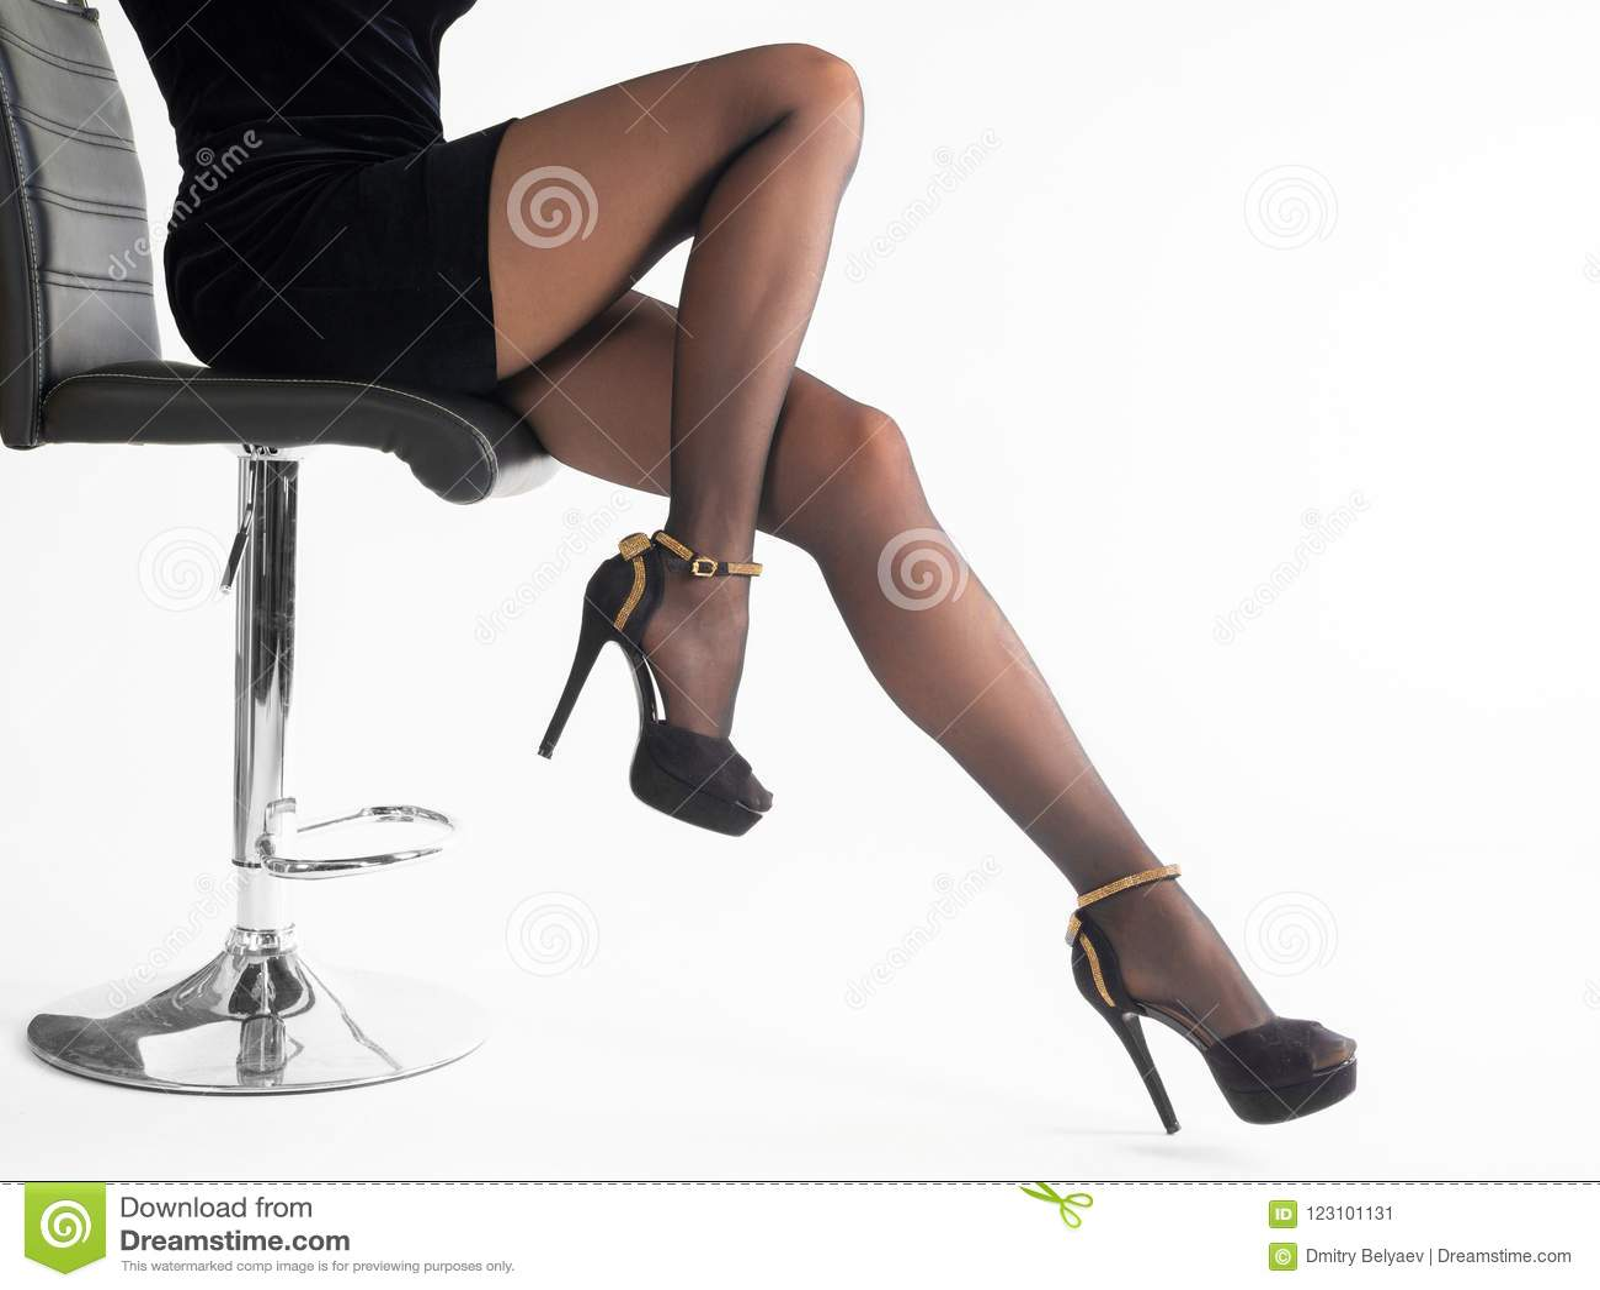 leopard high heel chair meditation floor back support heal lovingheartdesigns